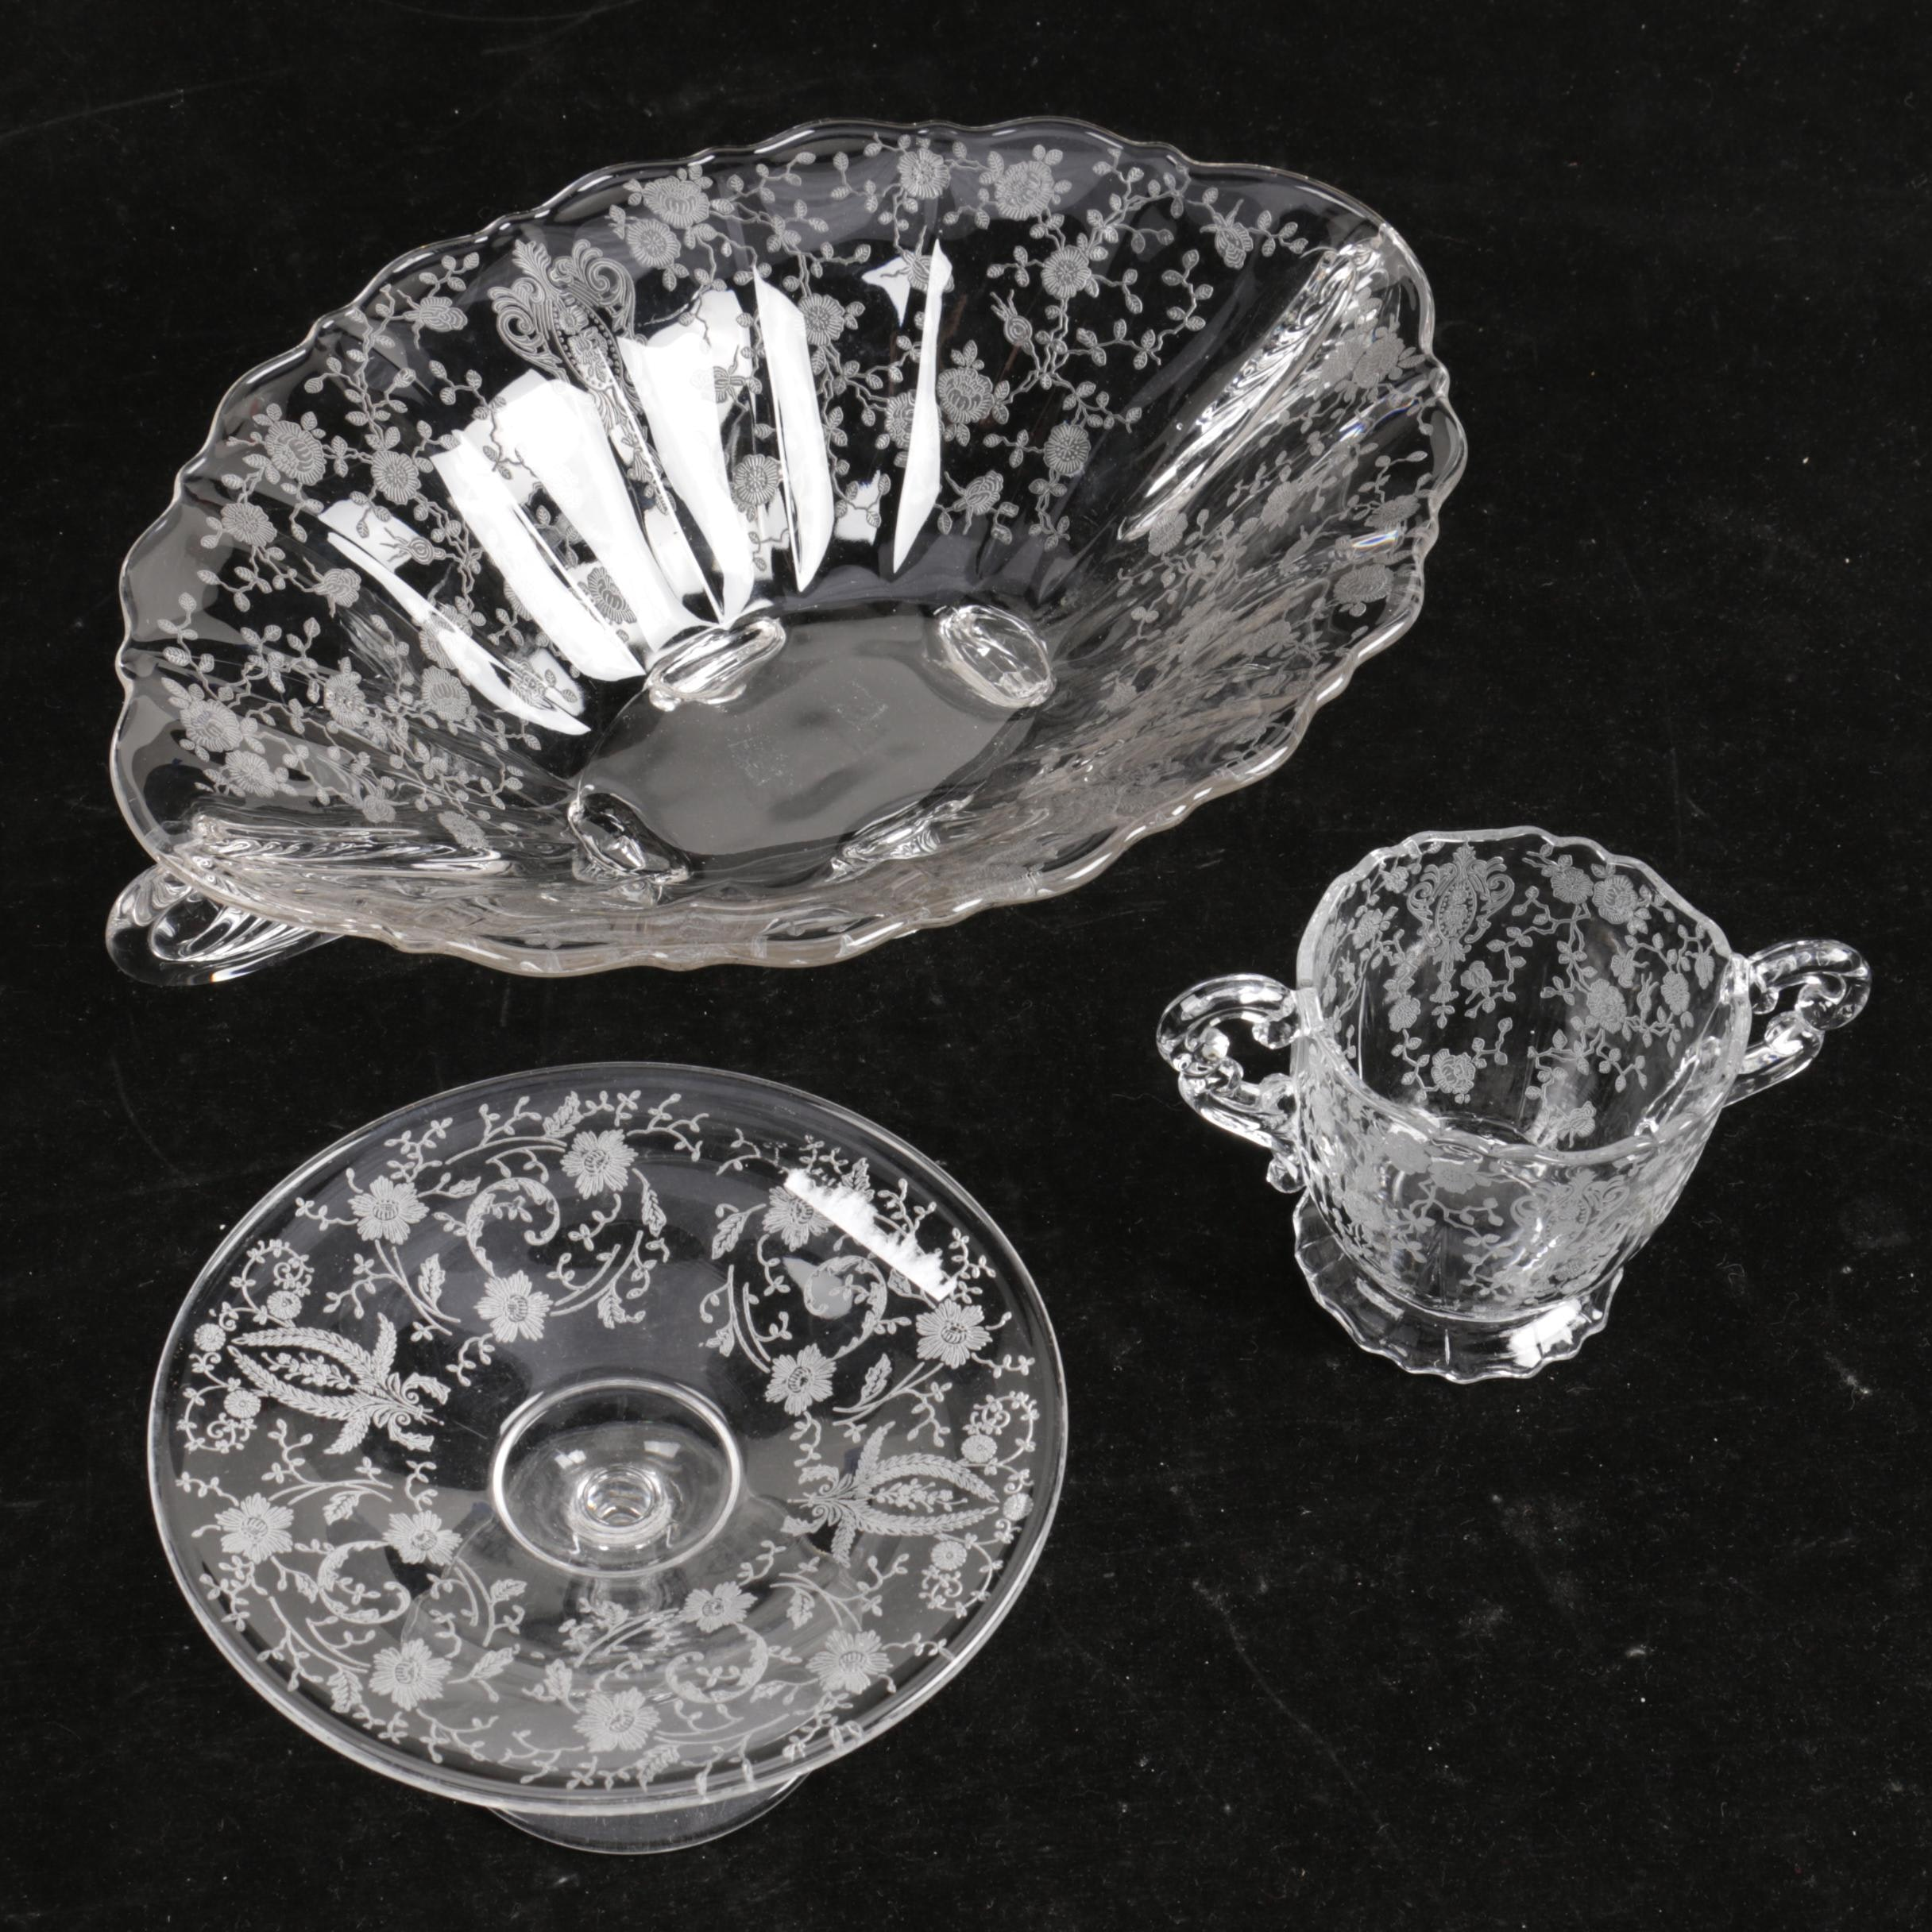 Vintage Etched Glass Serveware Including aCambridge Rosepoint Bowl